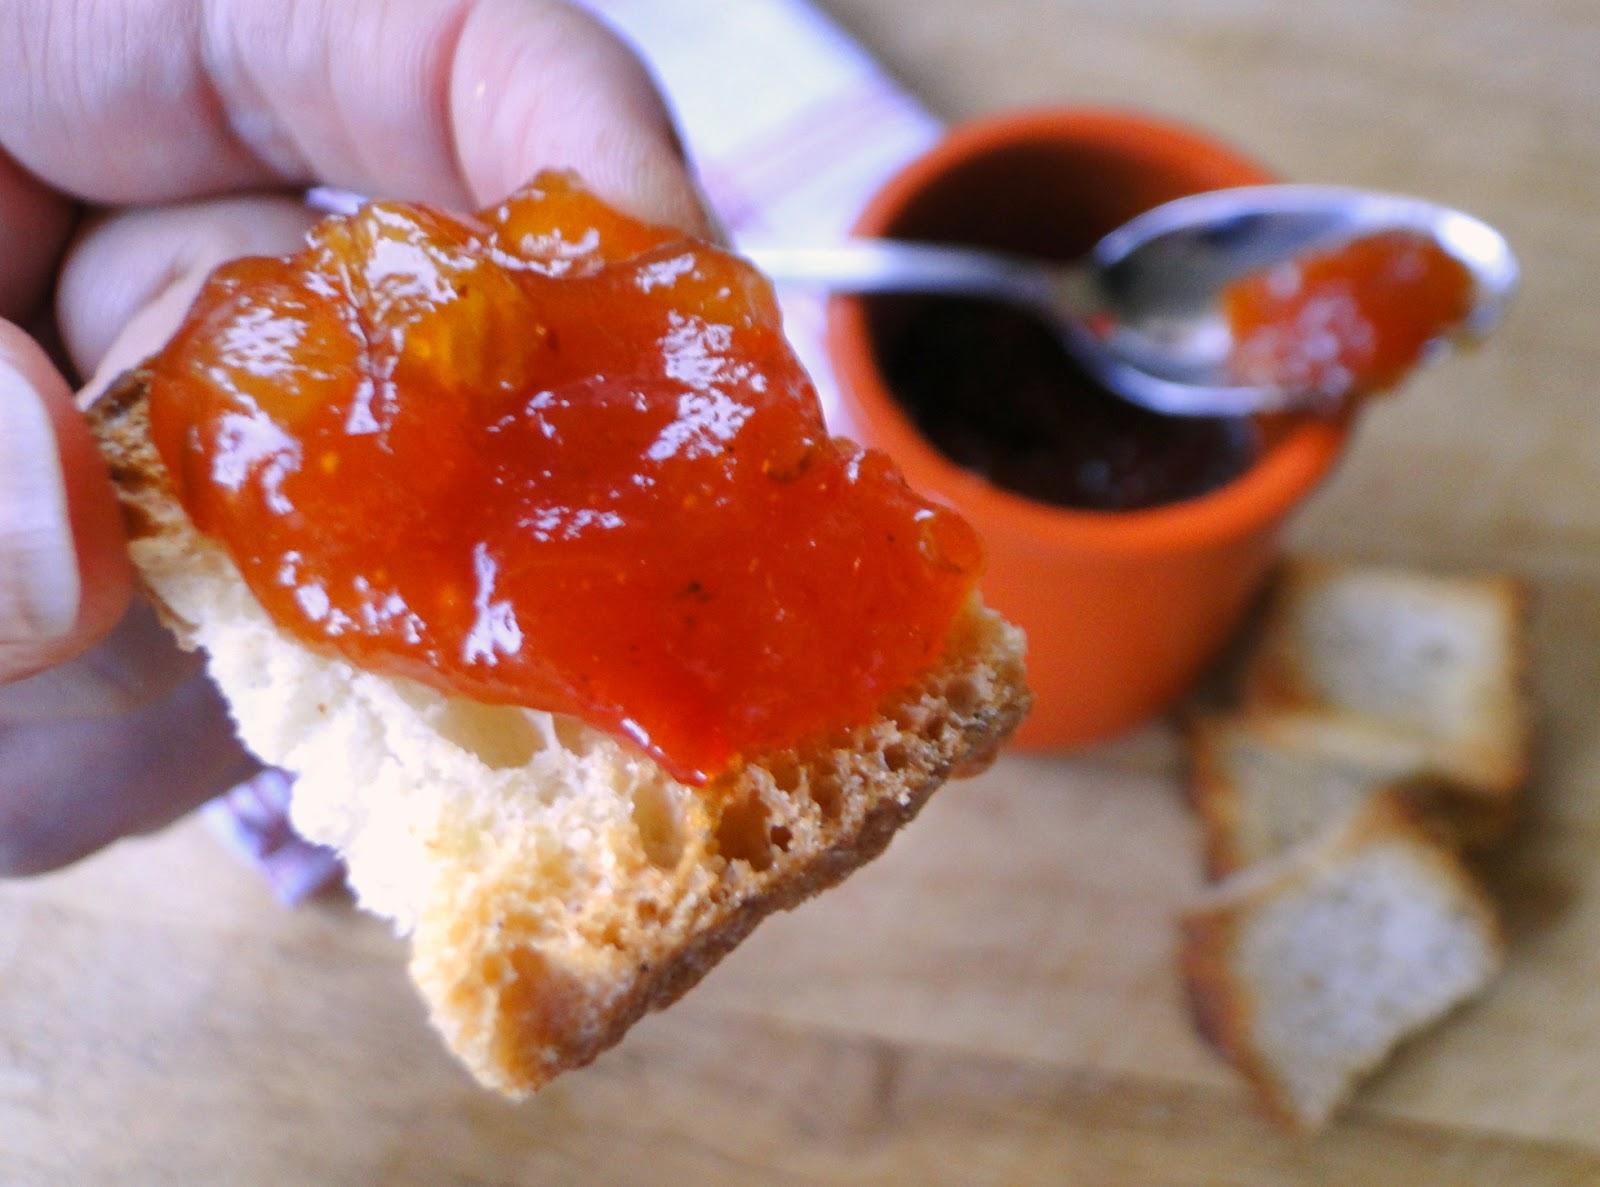 zelfgemaakte tomatenchutney op toast